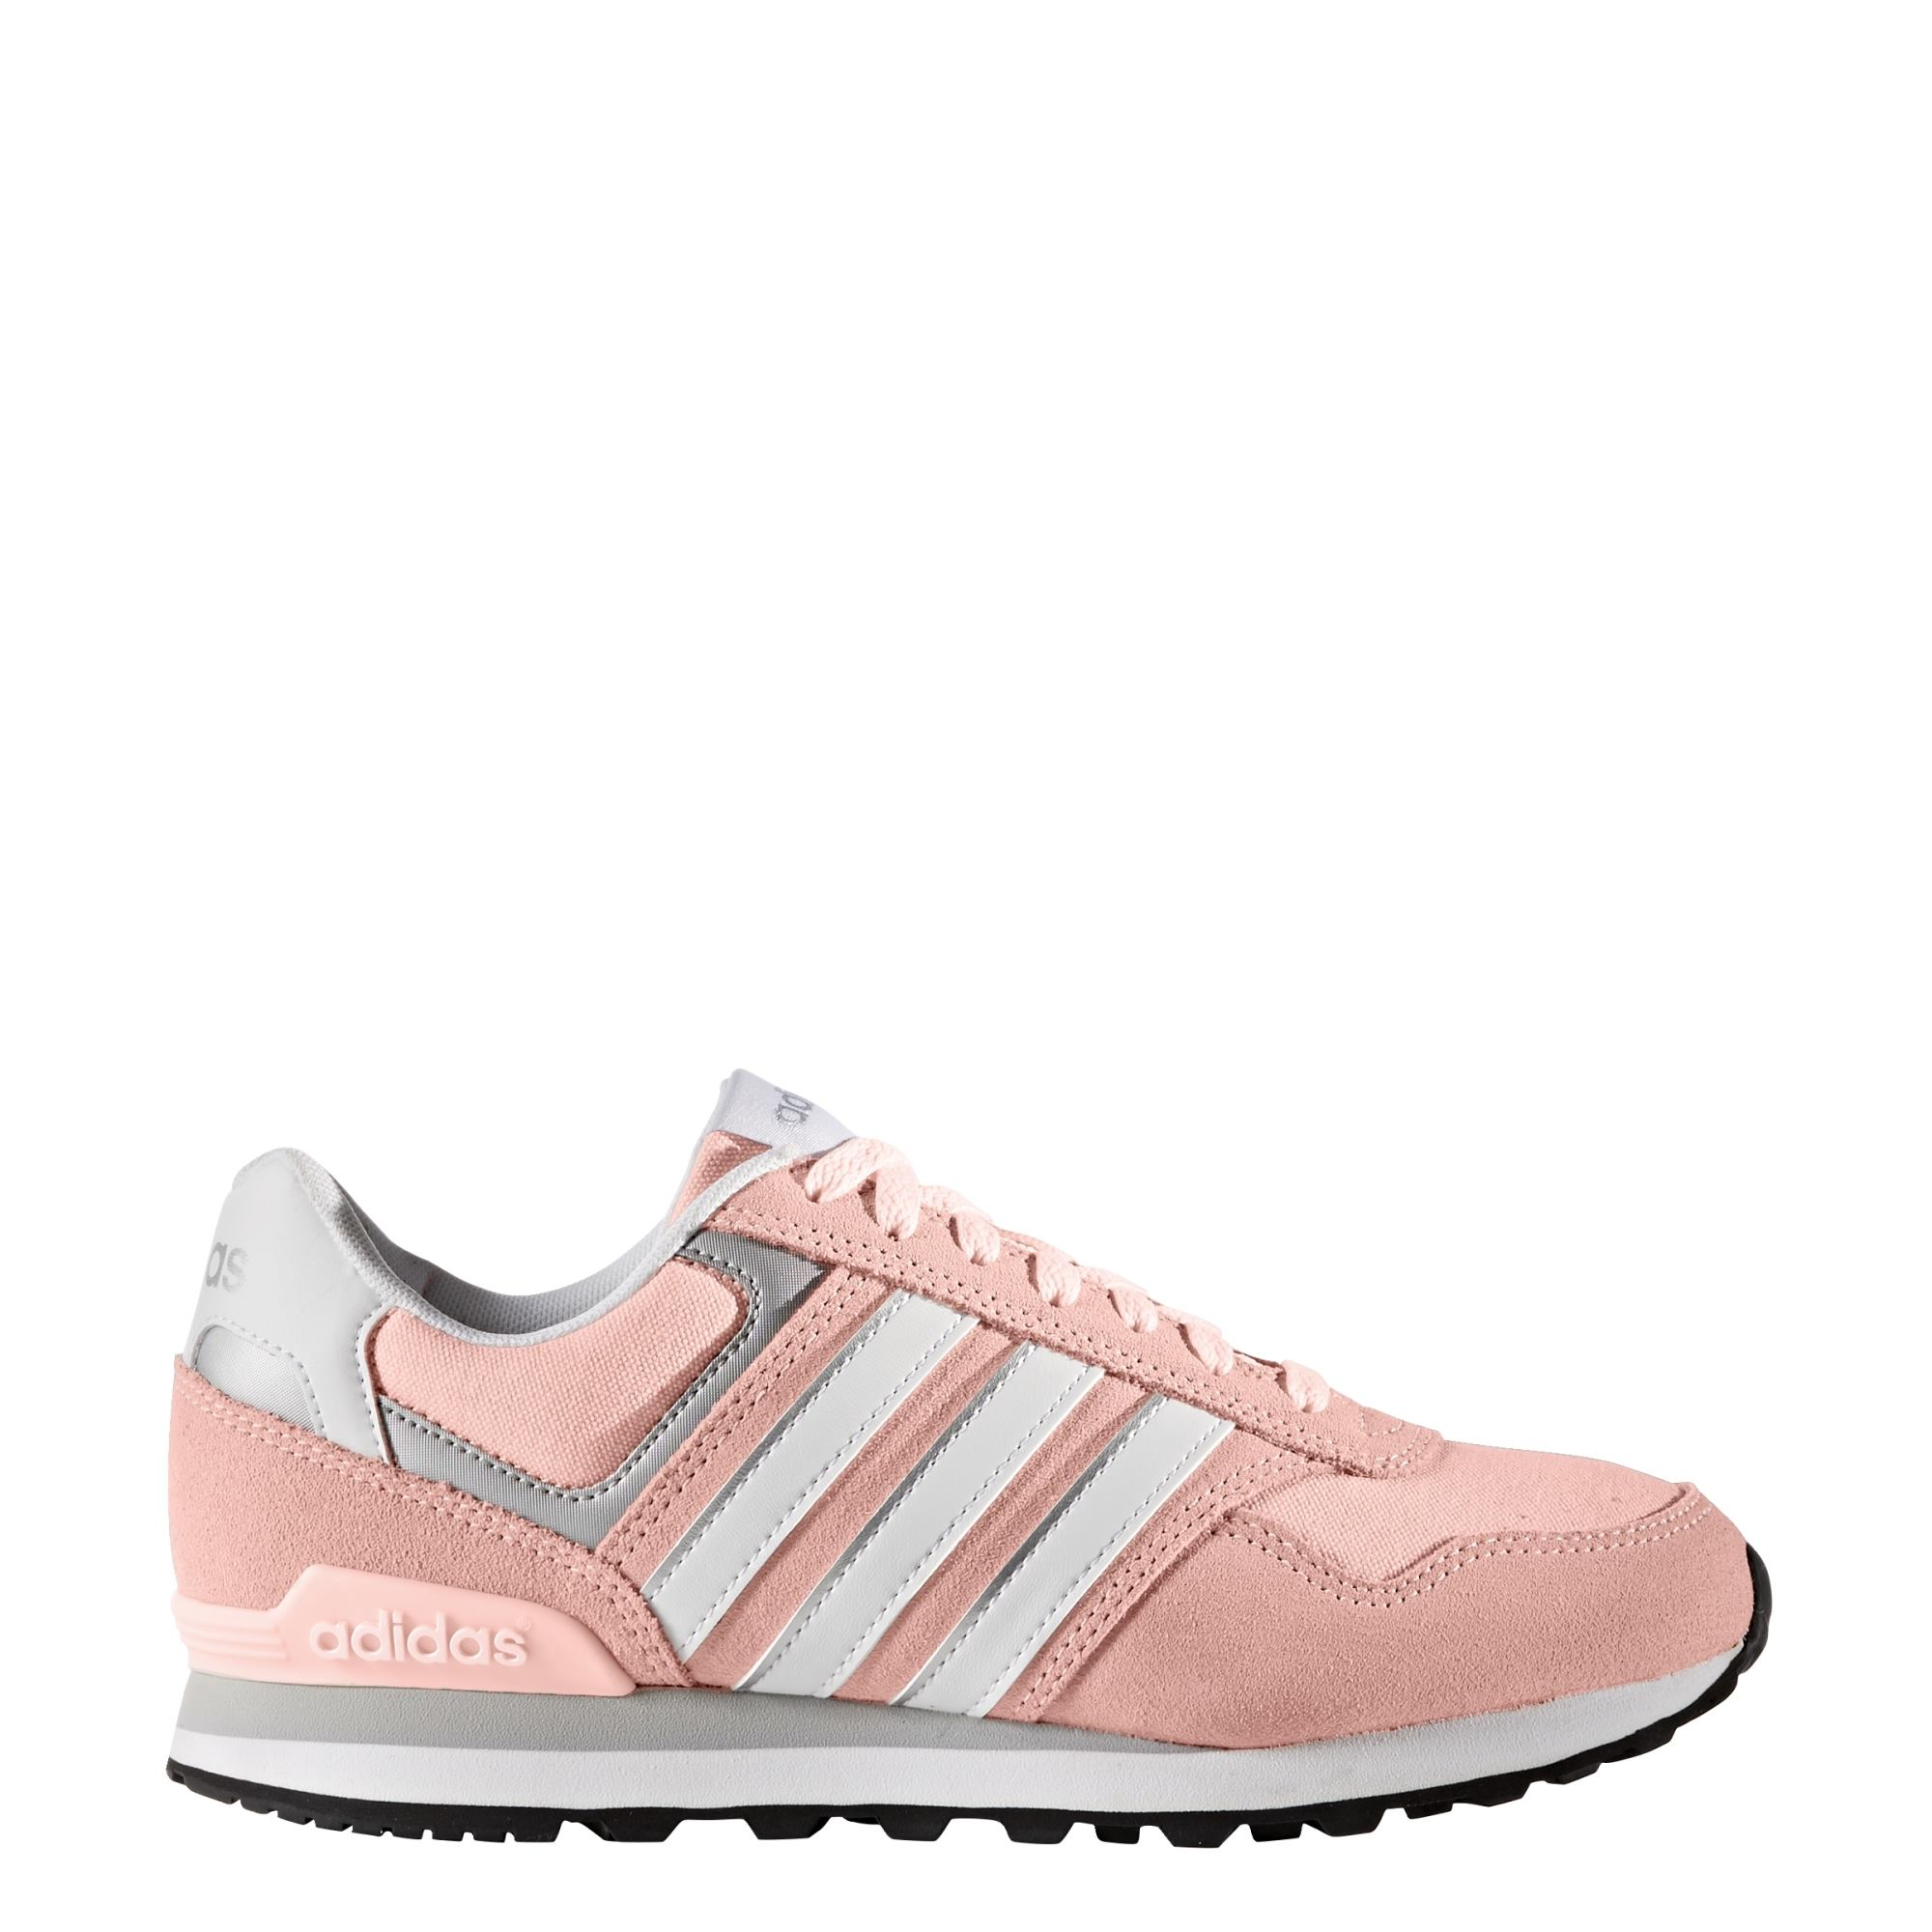 Adidas 10K Dames sneakers